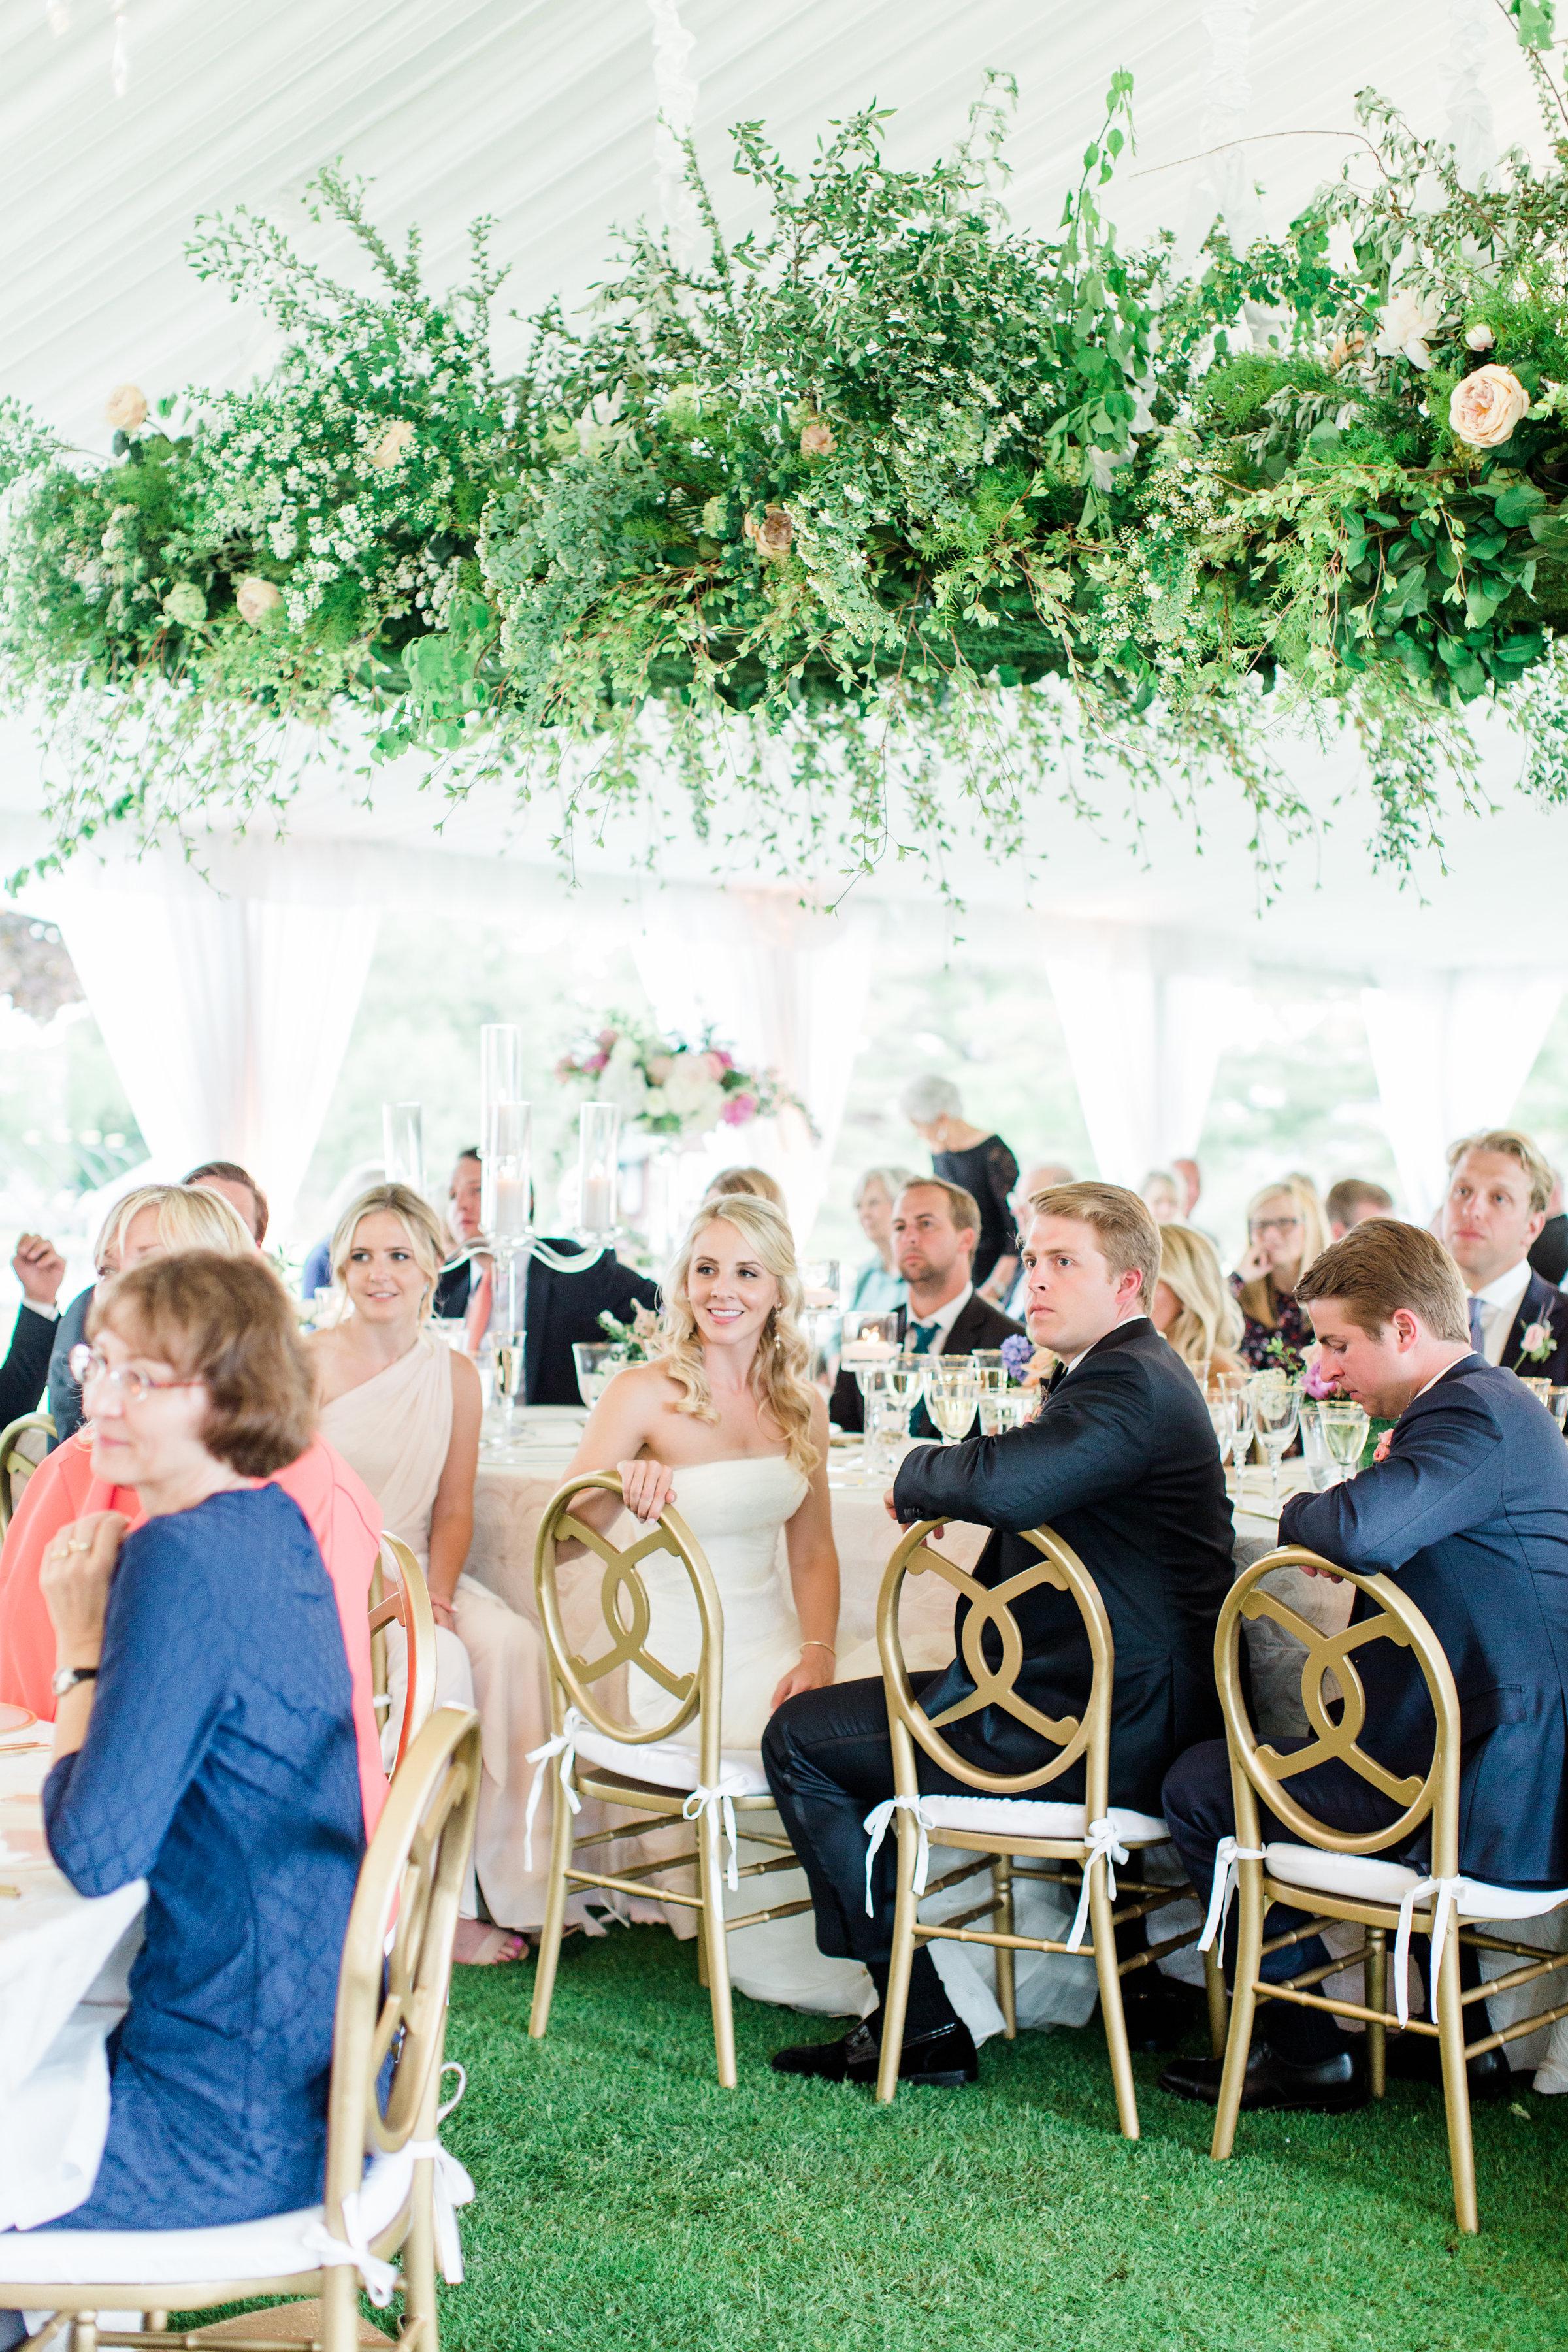 Coffman+Wedding+reception-110.jpg